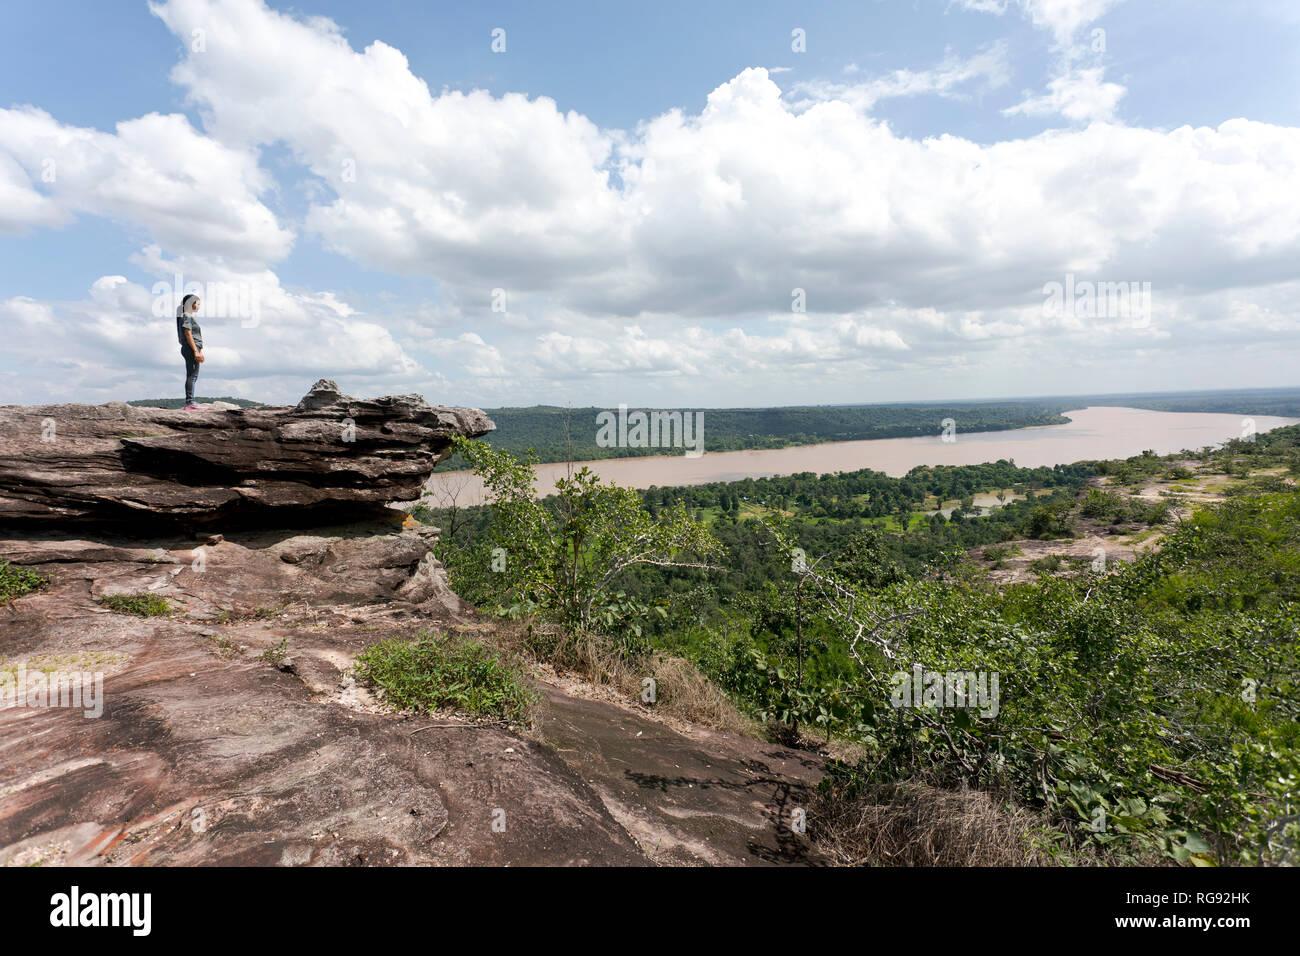 Thailand, Ubon Ratchathani Province, Pha Taem National Park, Woman looking to Mekong river, border to Laos - Stock Image